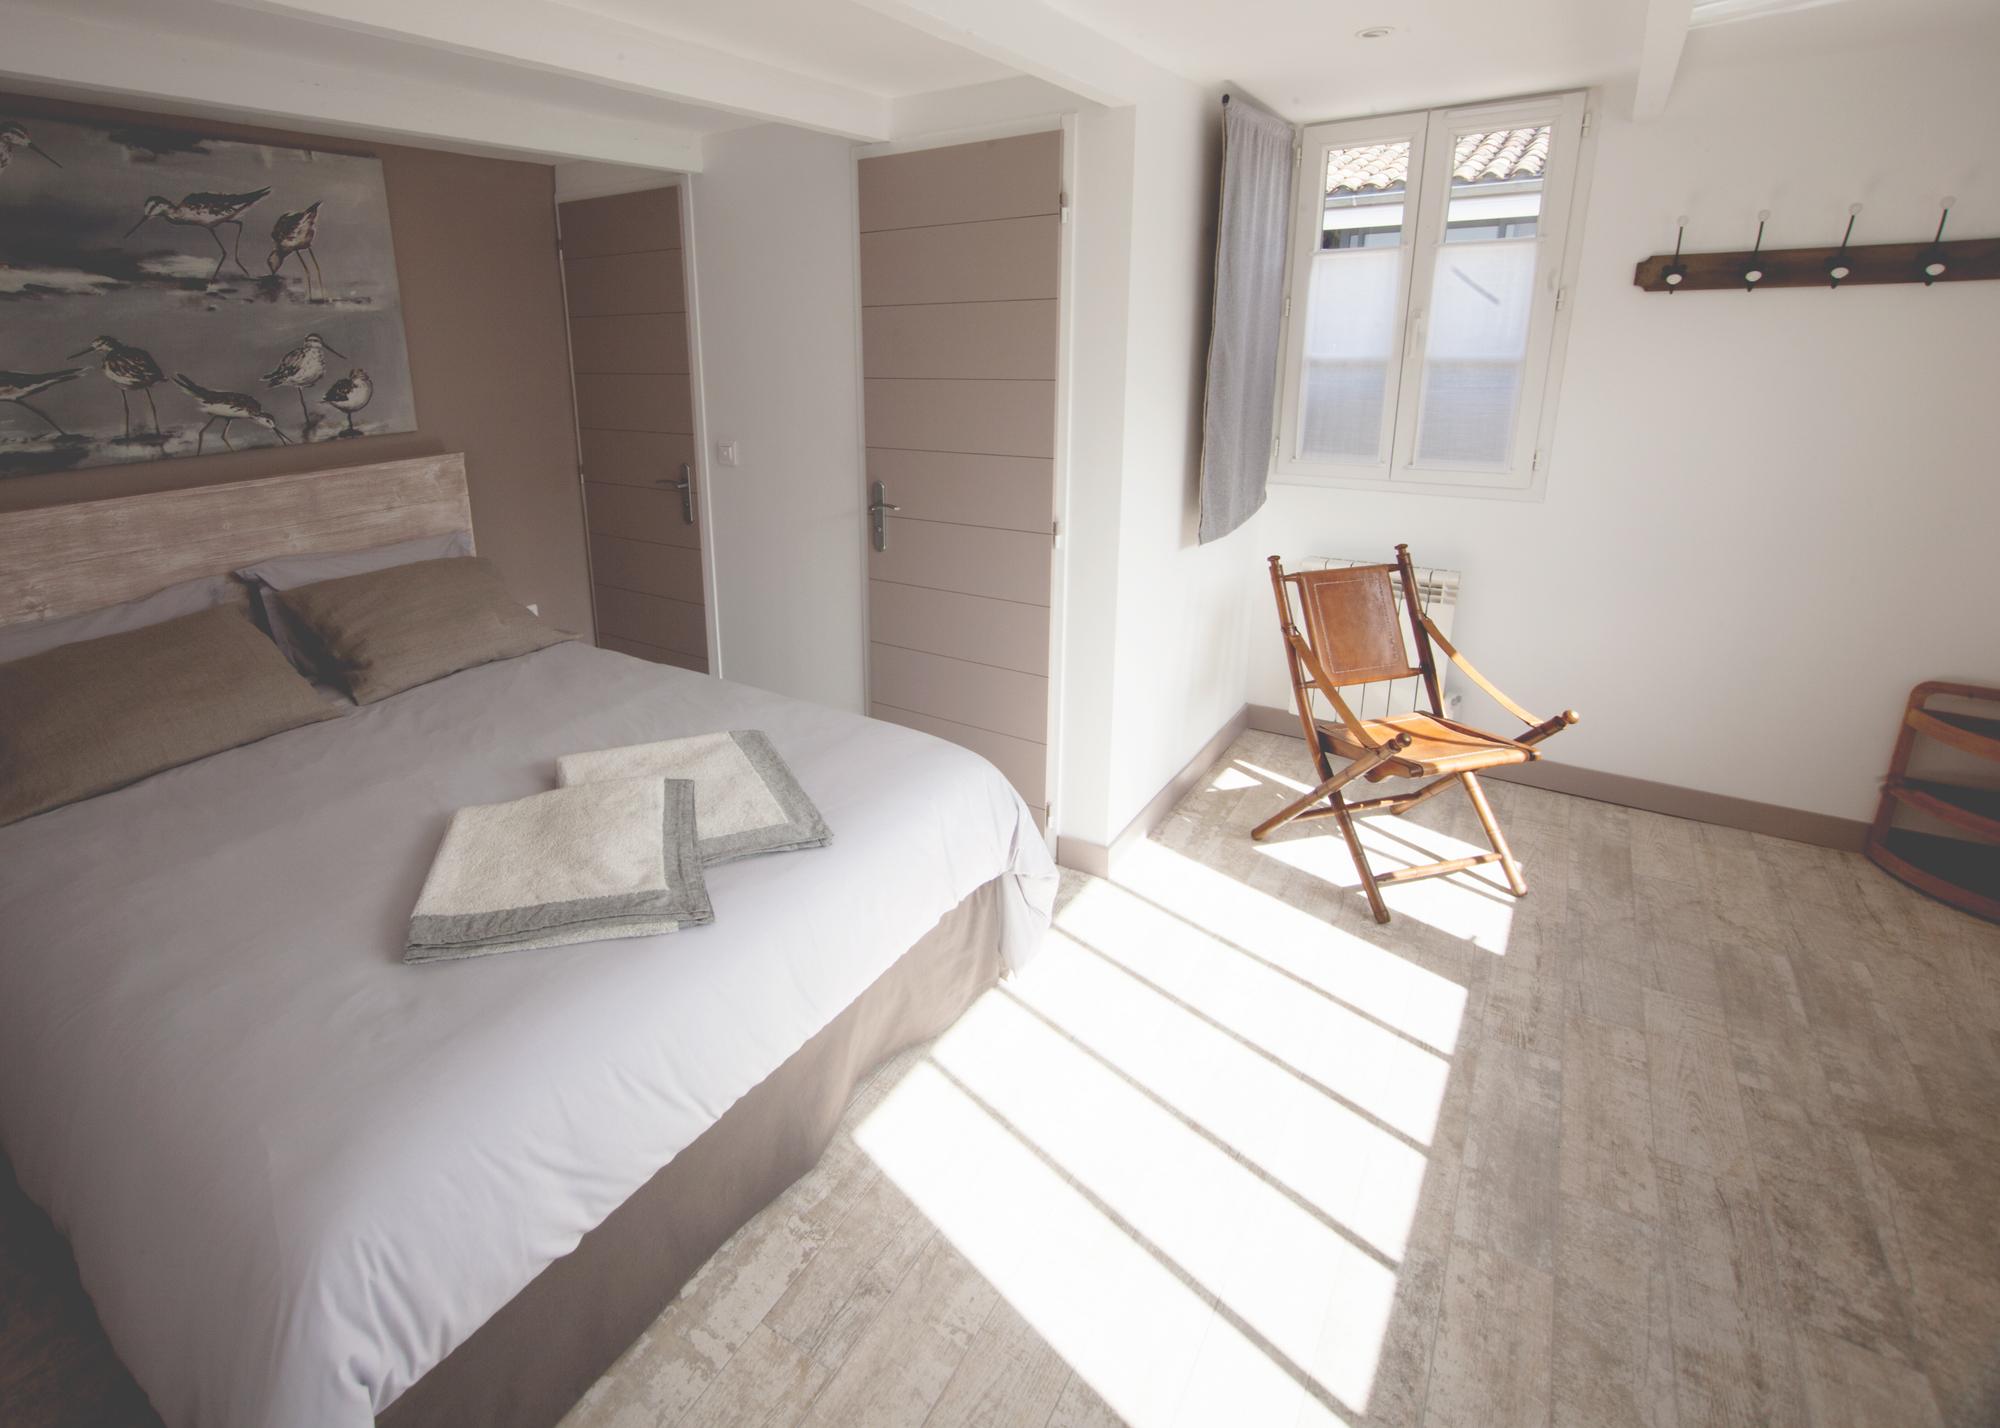 lesajoncs-maisondhotes-chambre-lolivier-planlarge.jpg